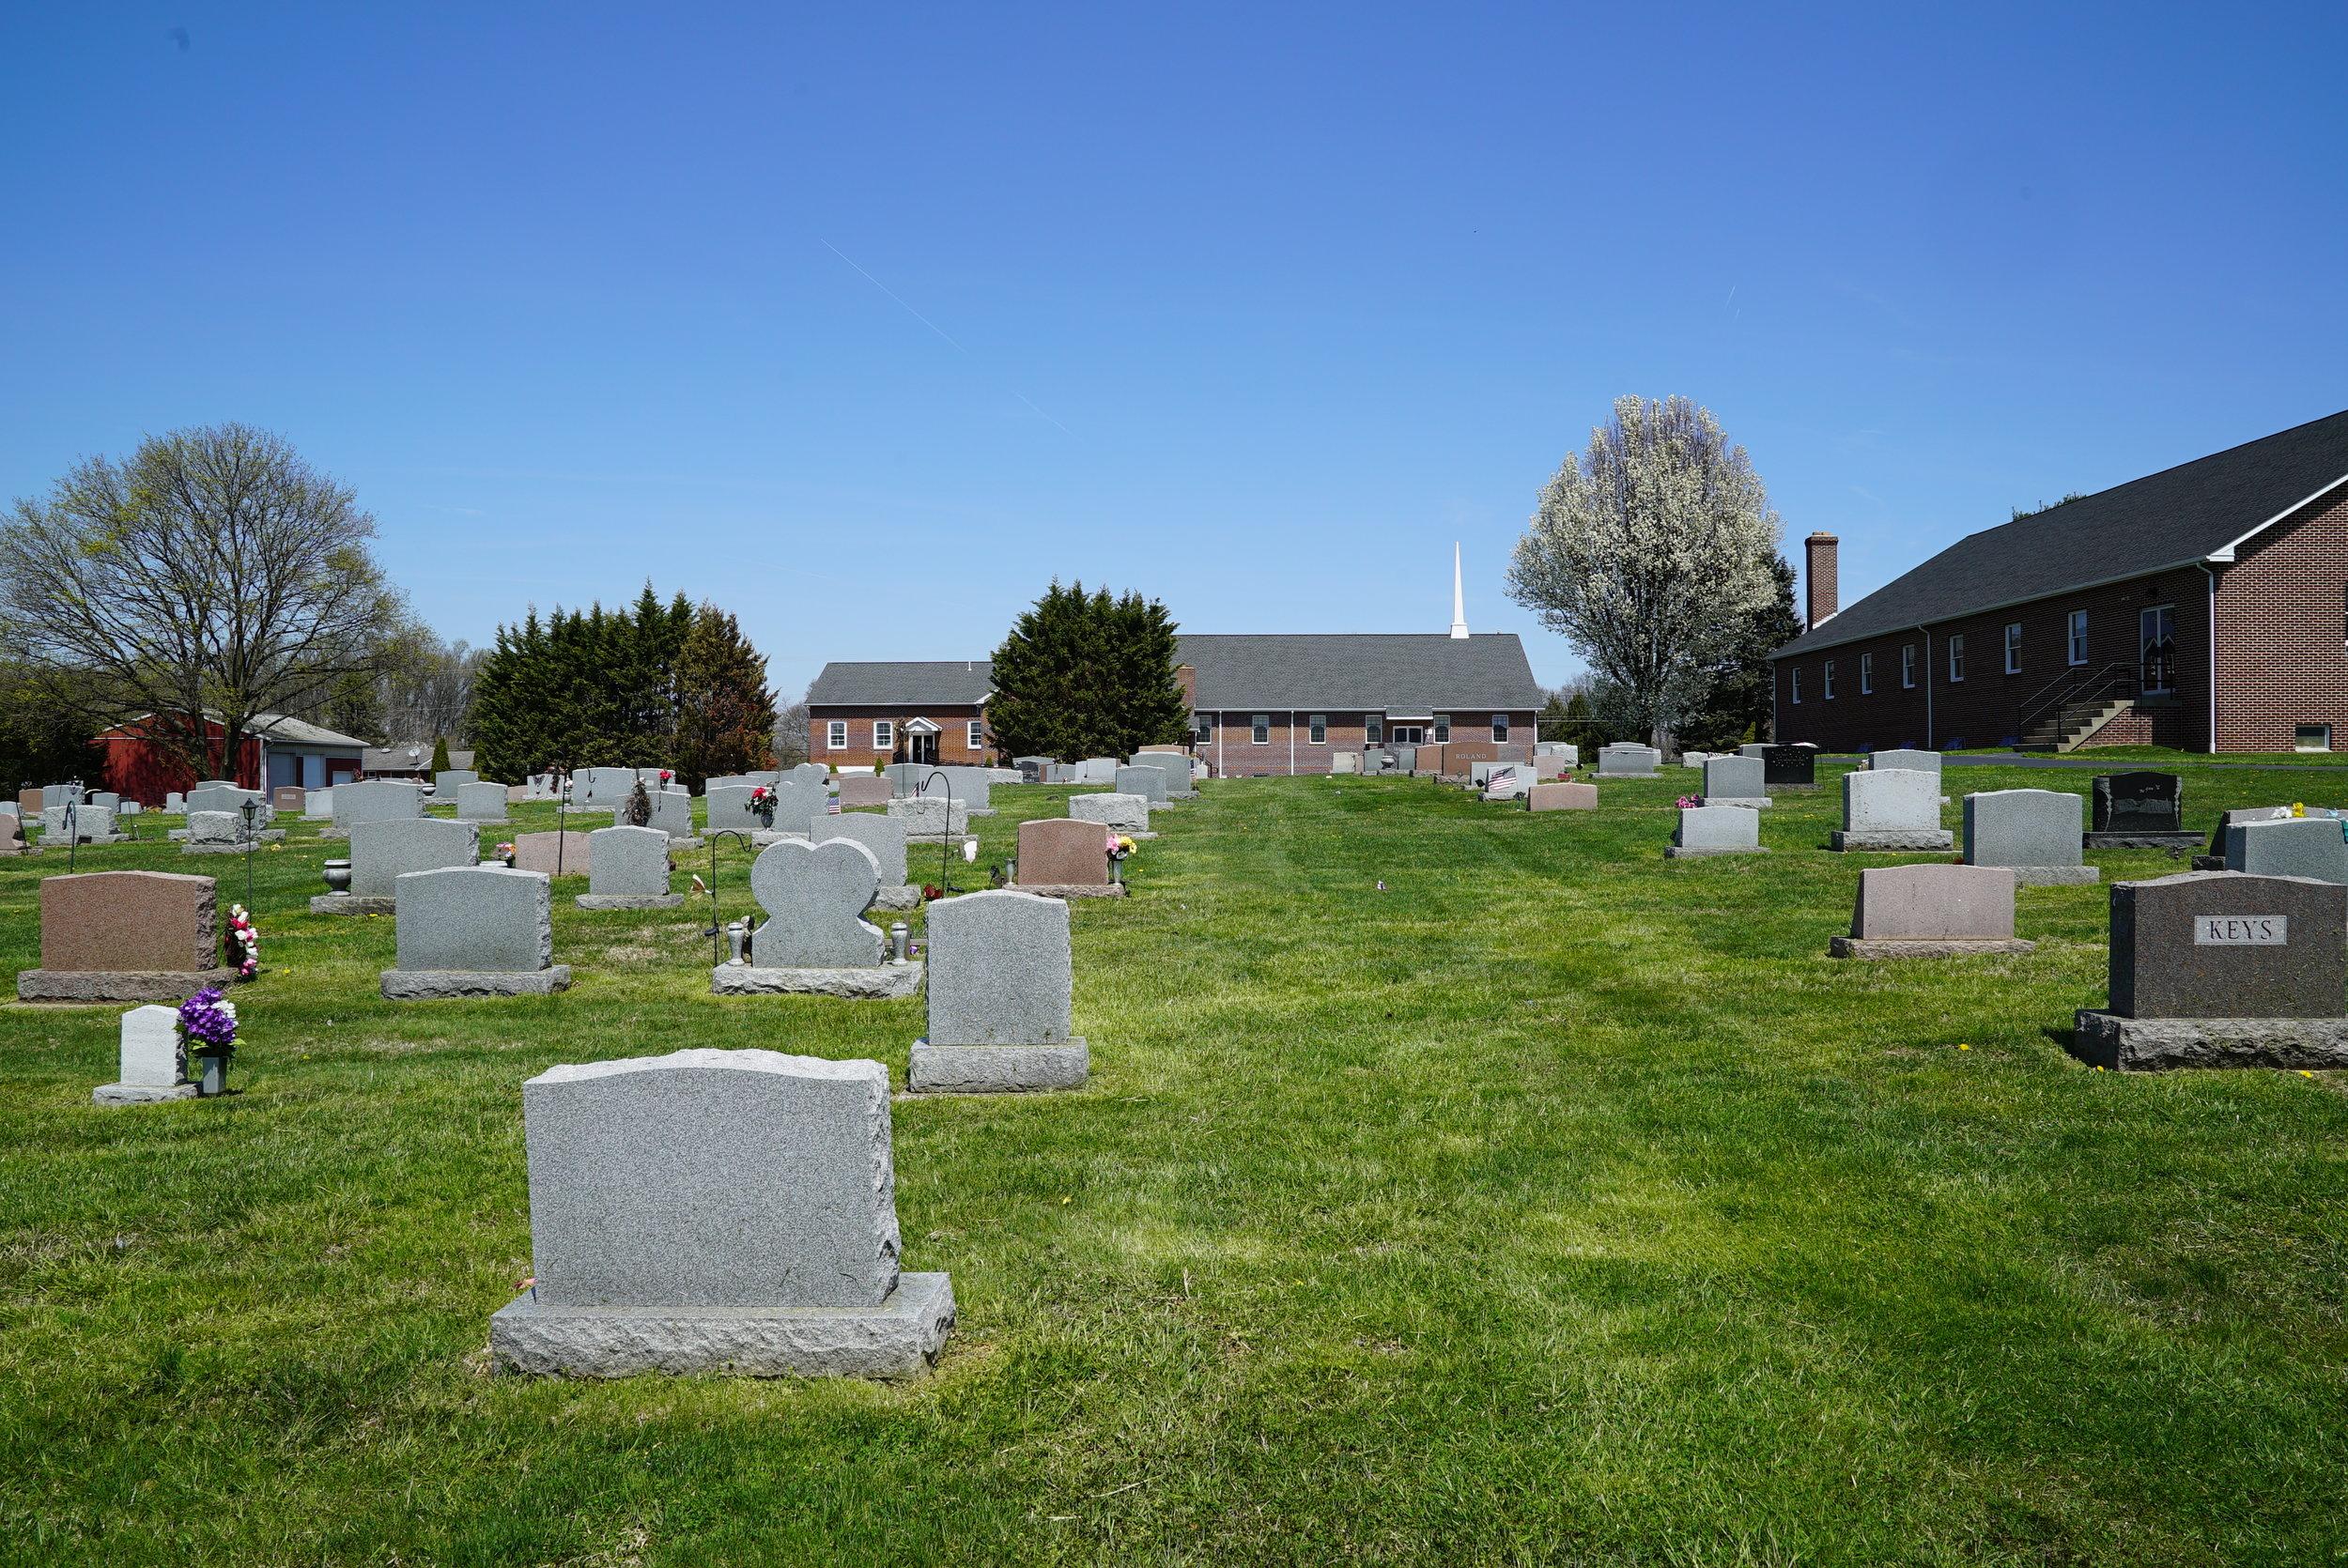 Nottingham Missionary Baptist Church Cemetery. Nottingham, Pennsylvania.